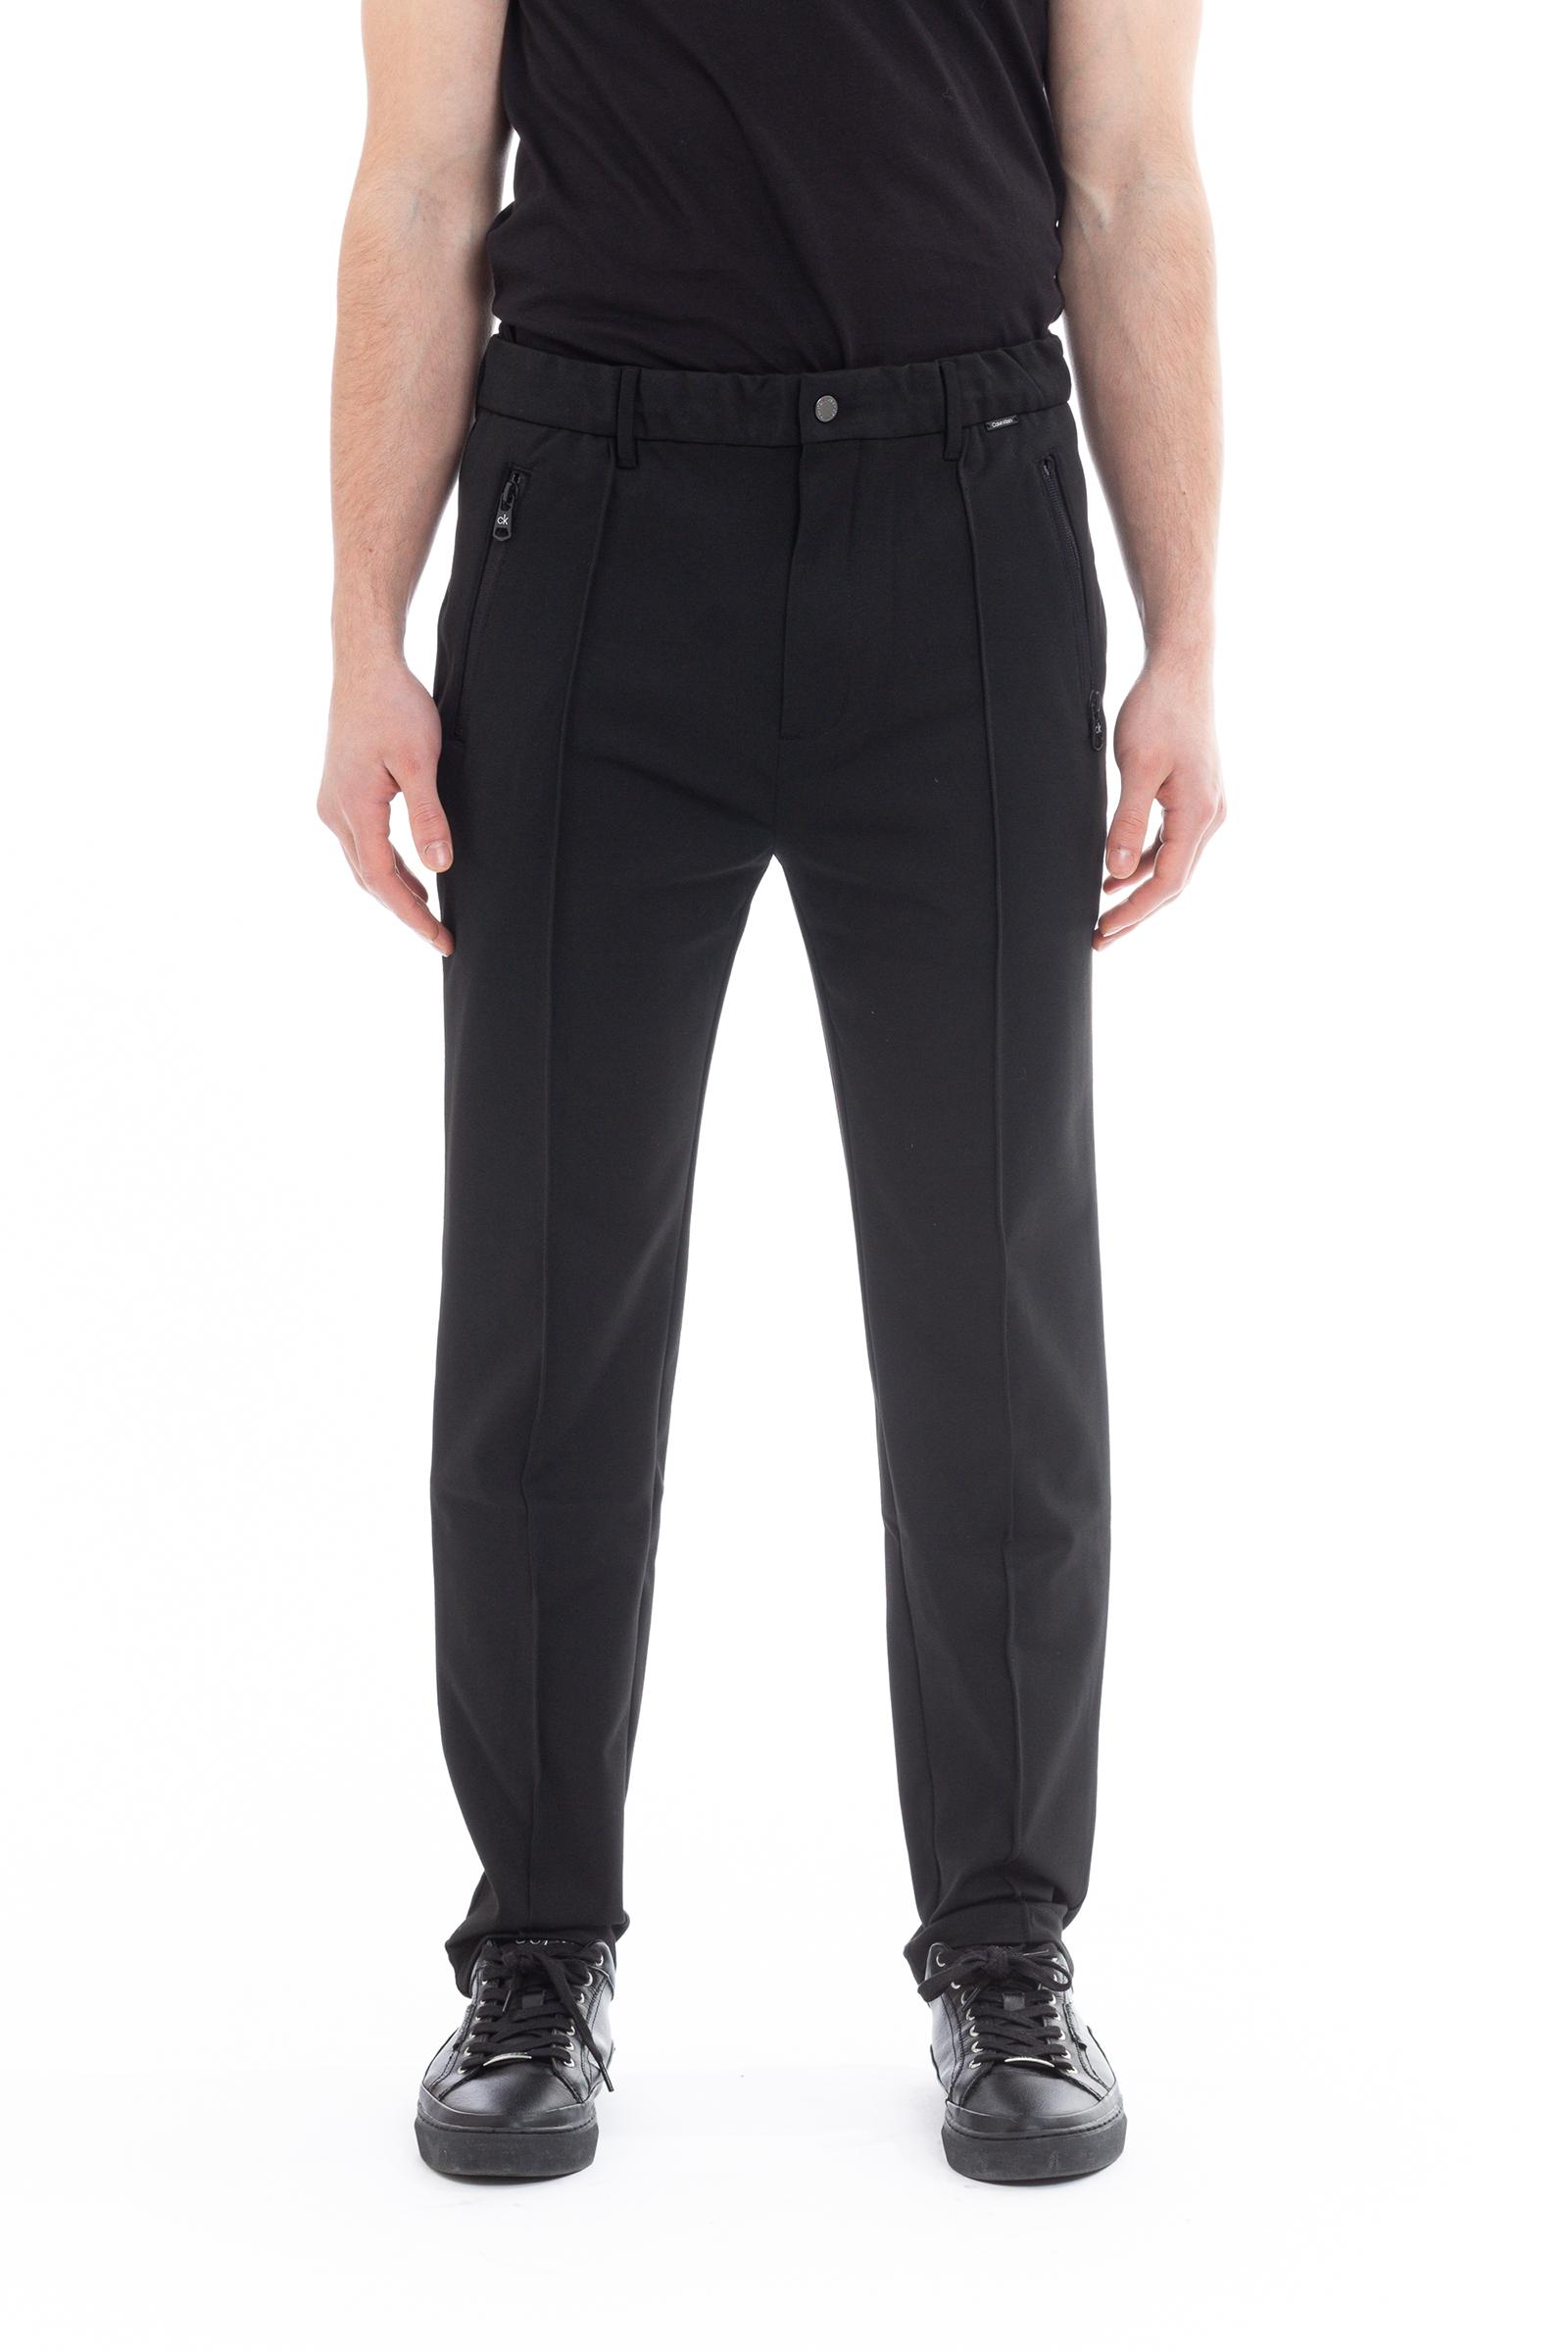 Calvin Klein Erkek Pantolon